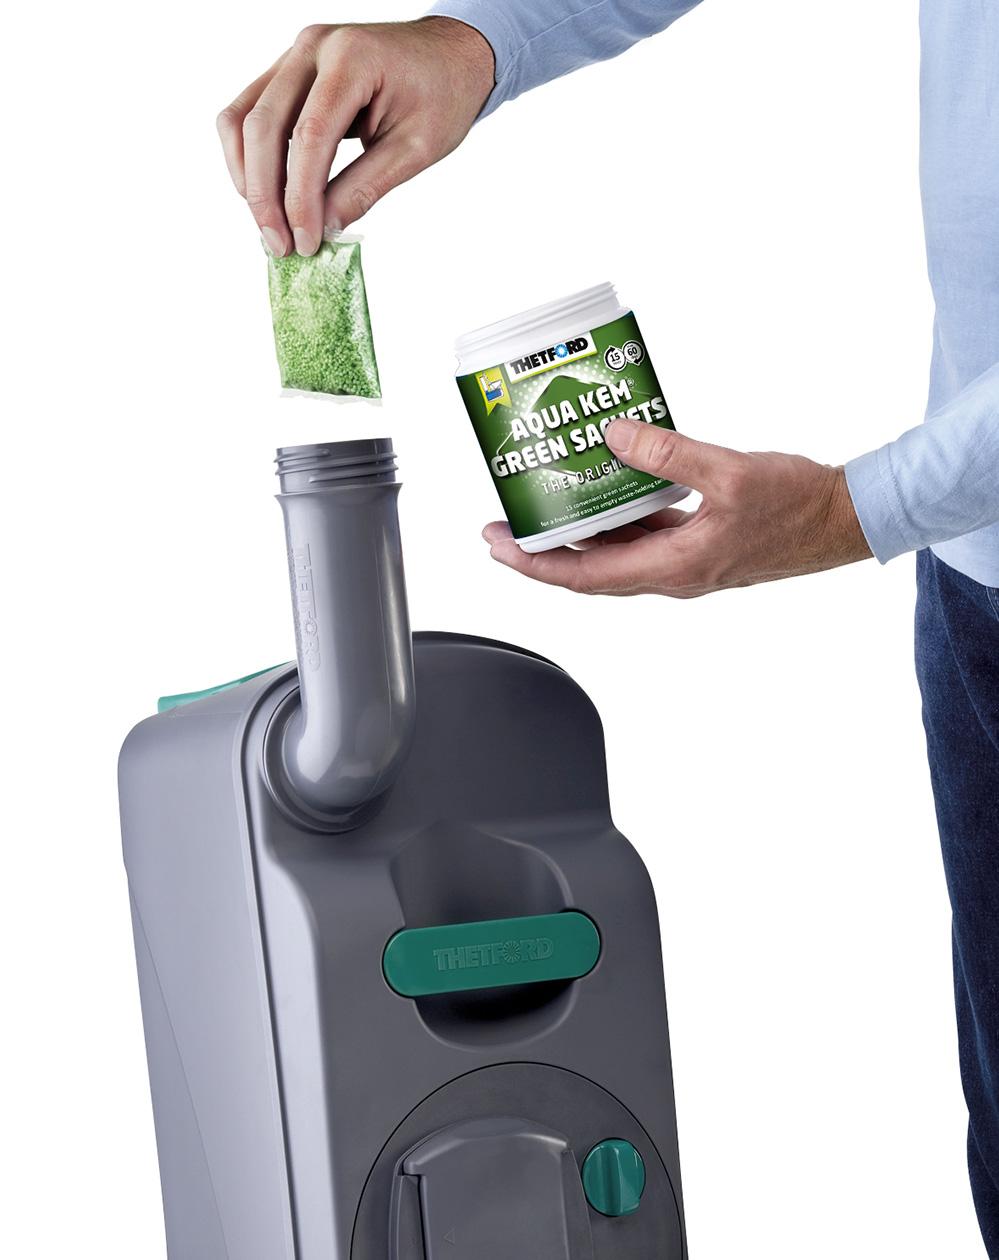 Aqua-Kem-Green-Sachets-saculeti-predozati-linemed